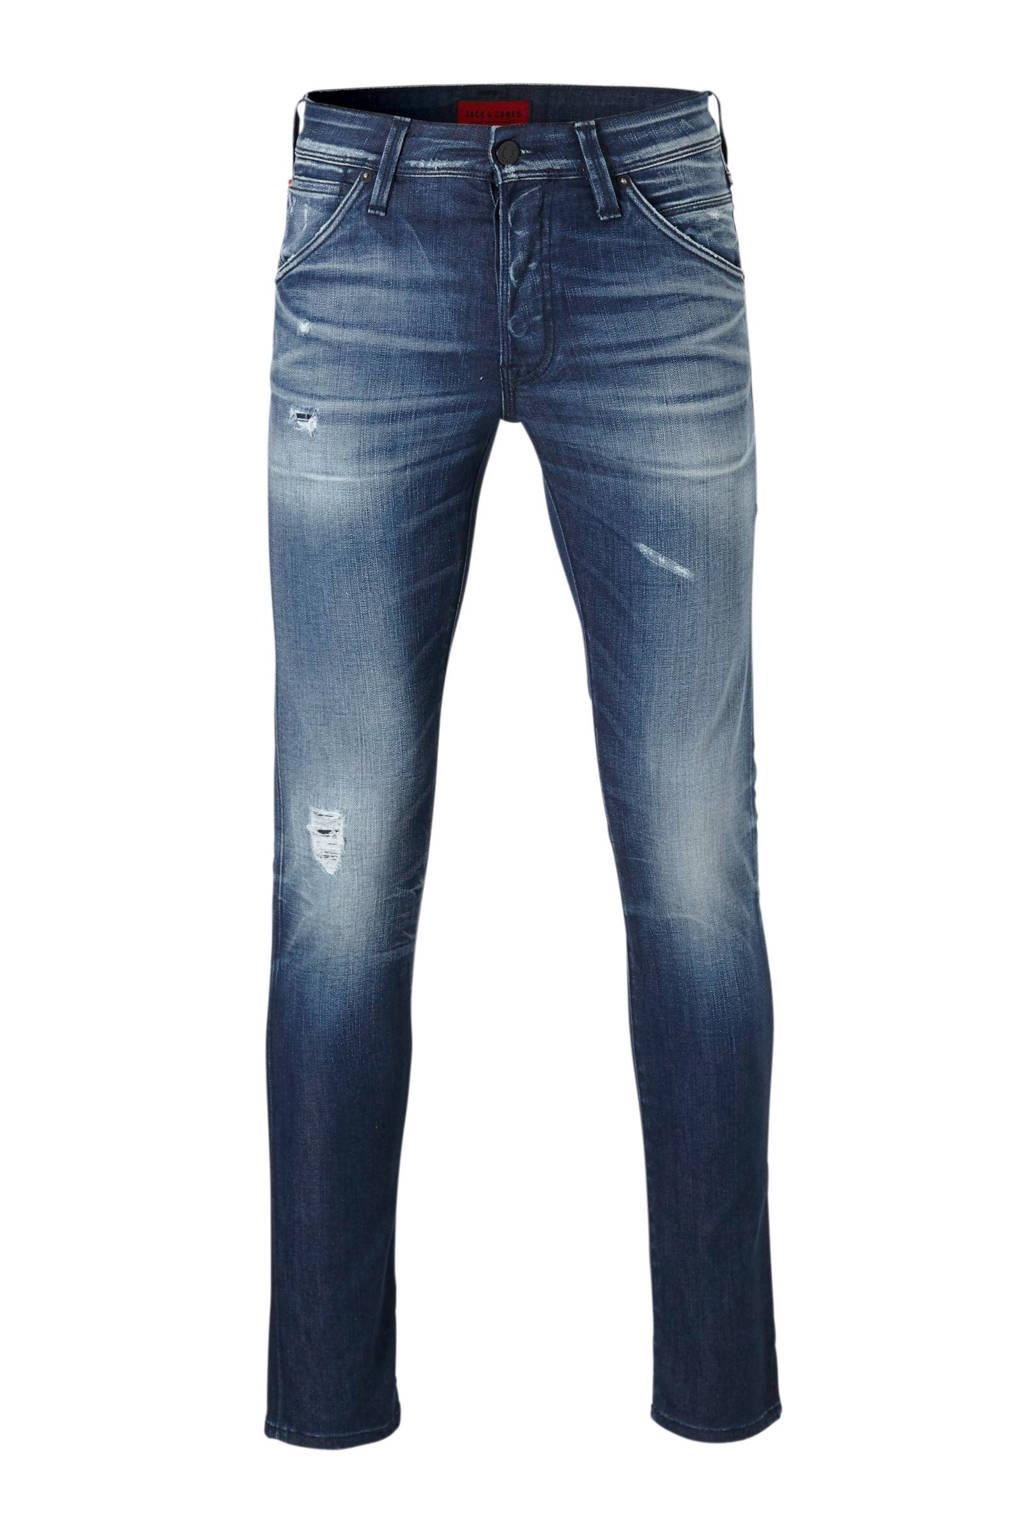 Jack & Jones Jeans Intelligence slim fit jeans Glenn, Dark denim